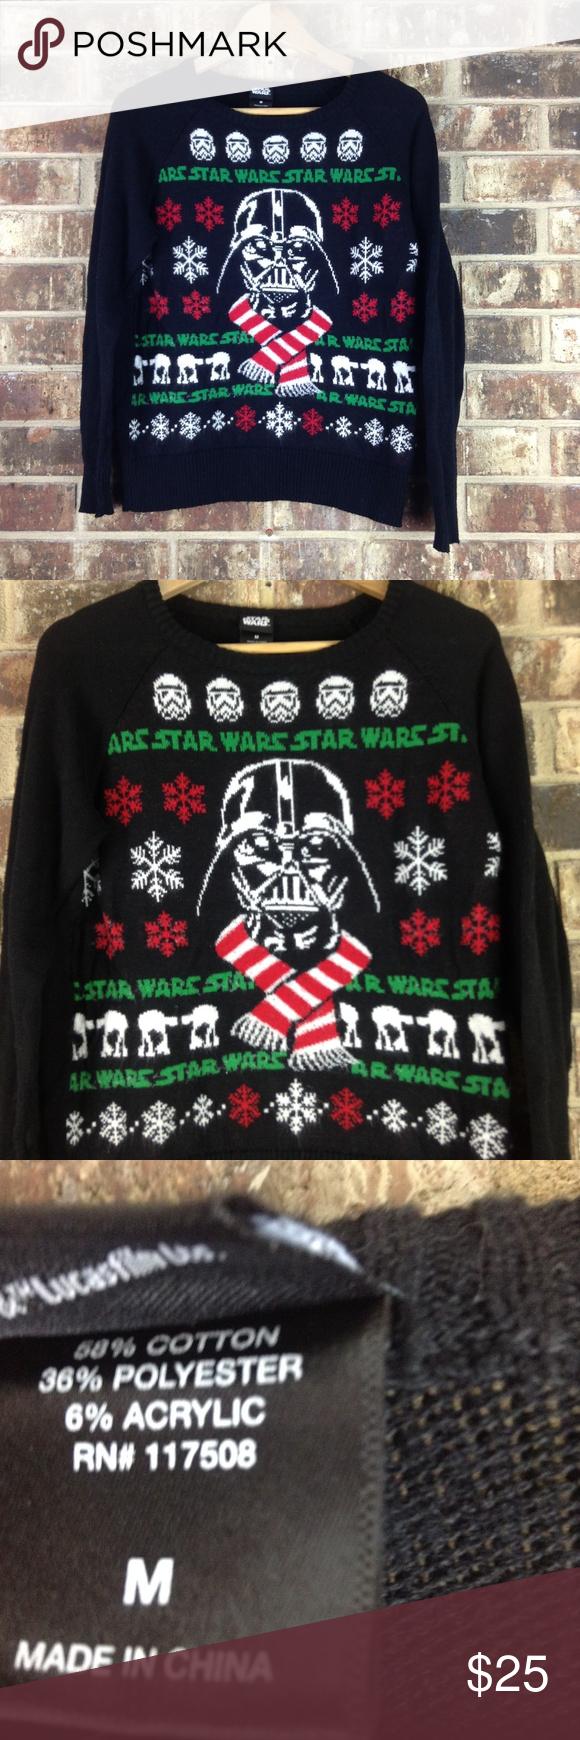 Star Wars Womens Ugly Christmas Crew Sweatshirt